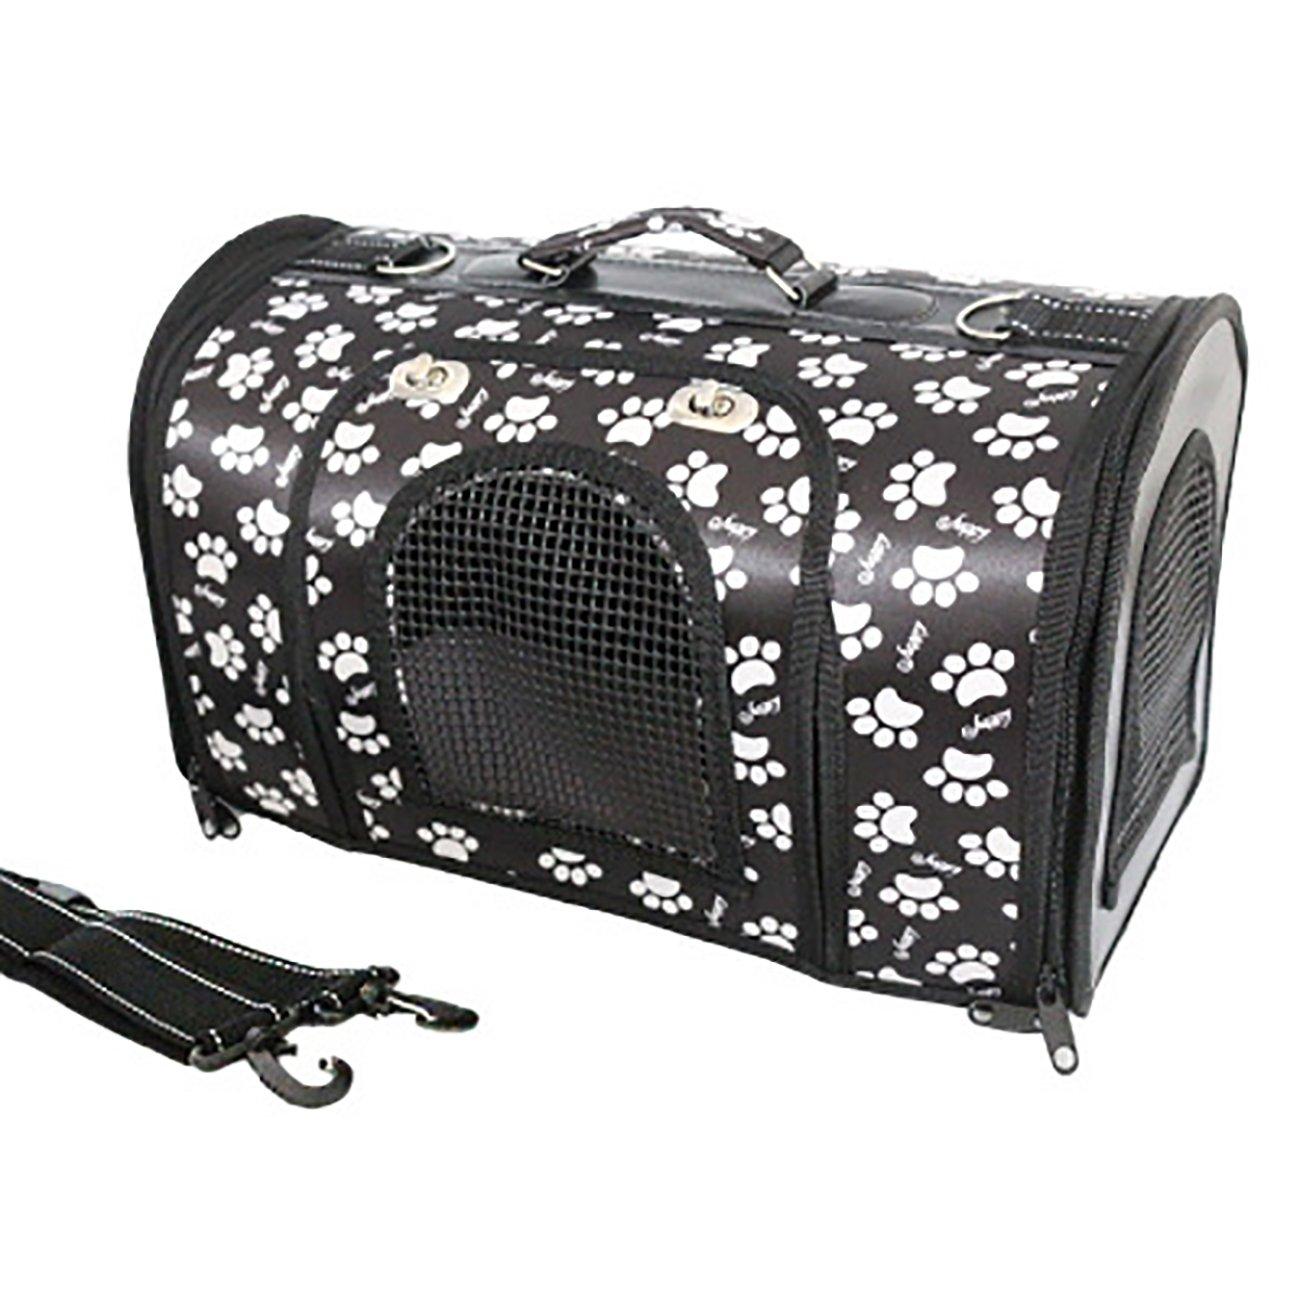 Black L black L UHeng Folding Portable Pet Dog Cat Carrier Mesh Fabric Canvas Travel Bag